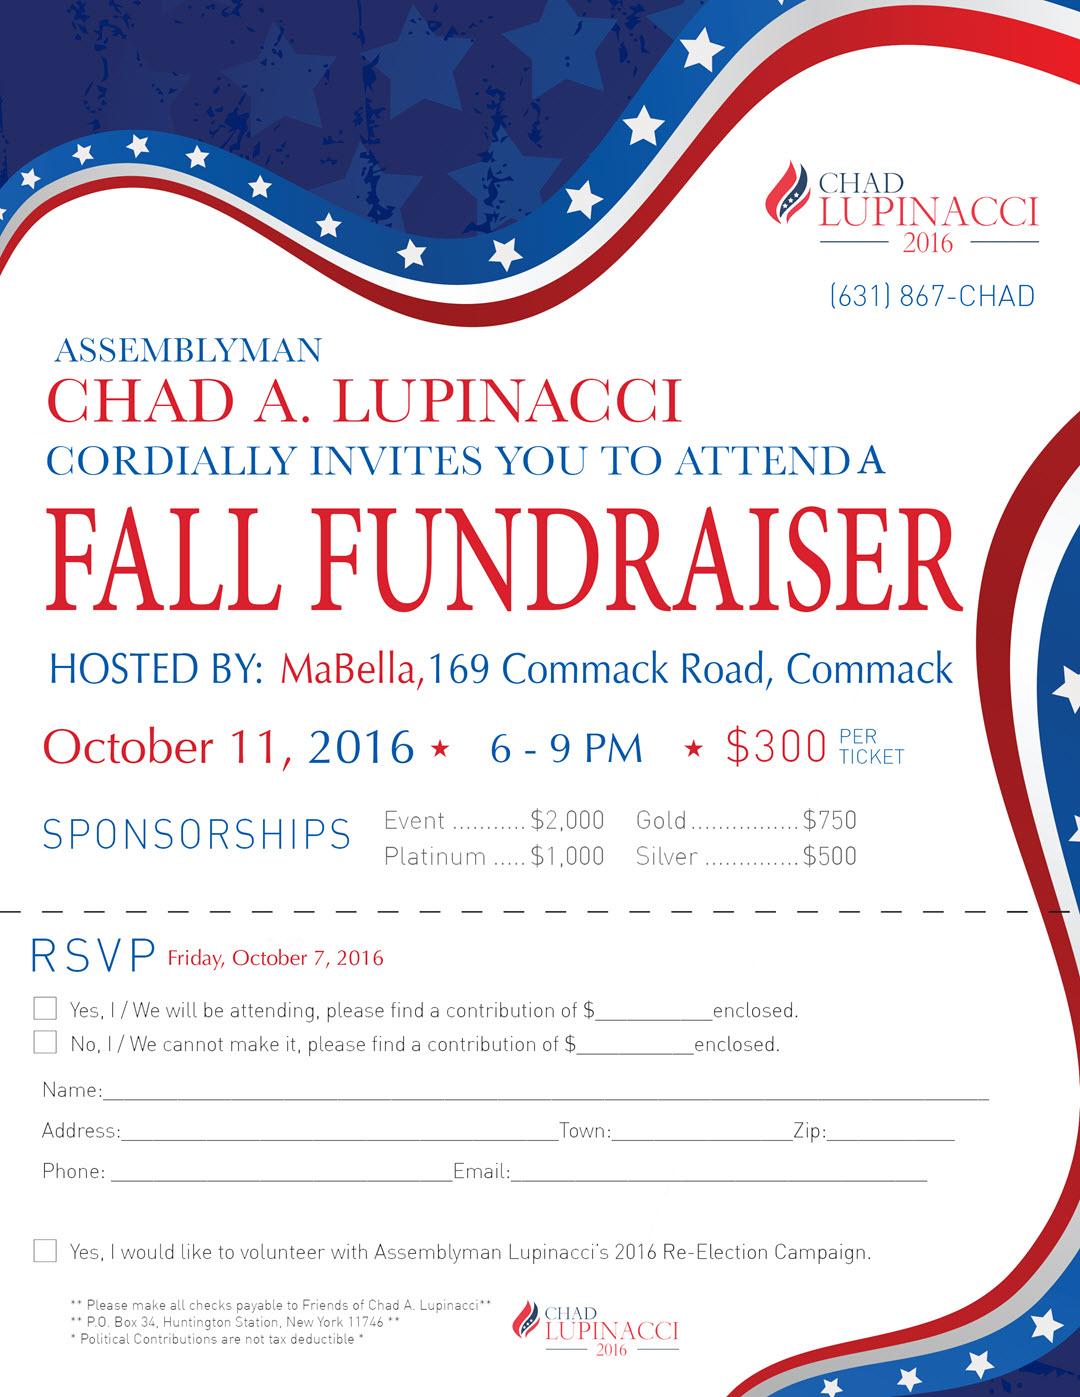 Chad Lupinacci Fall_Fundraiser